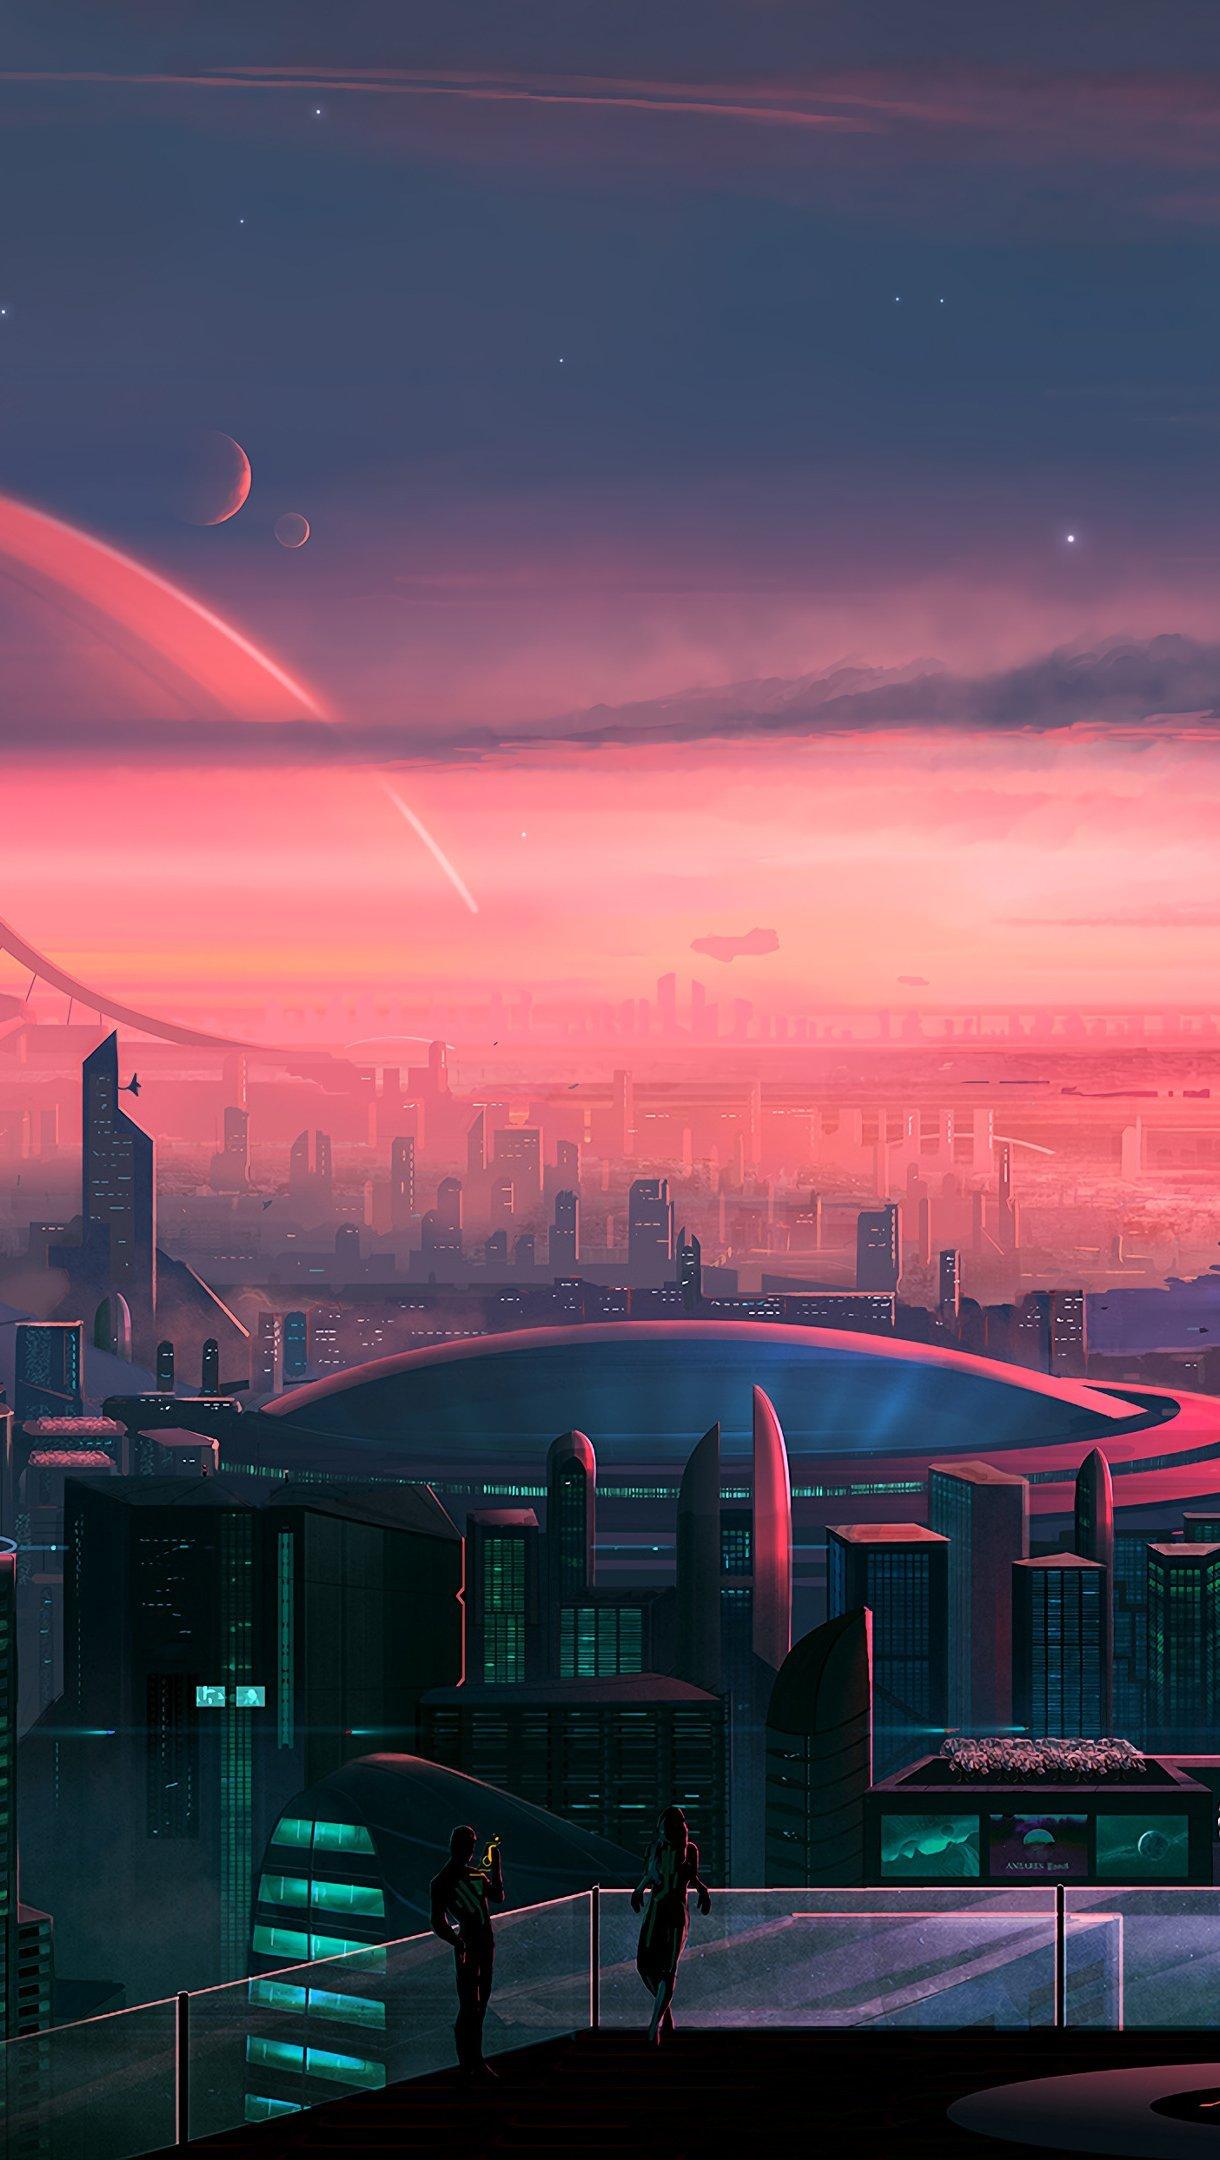 Wallpaper Scifi city scenery artwork Vertical